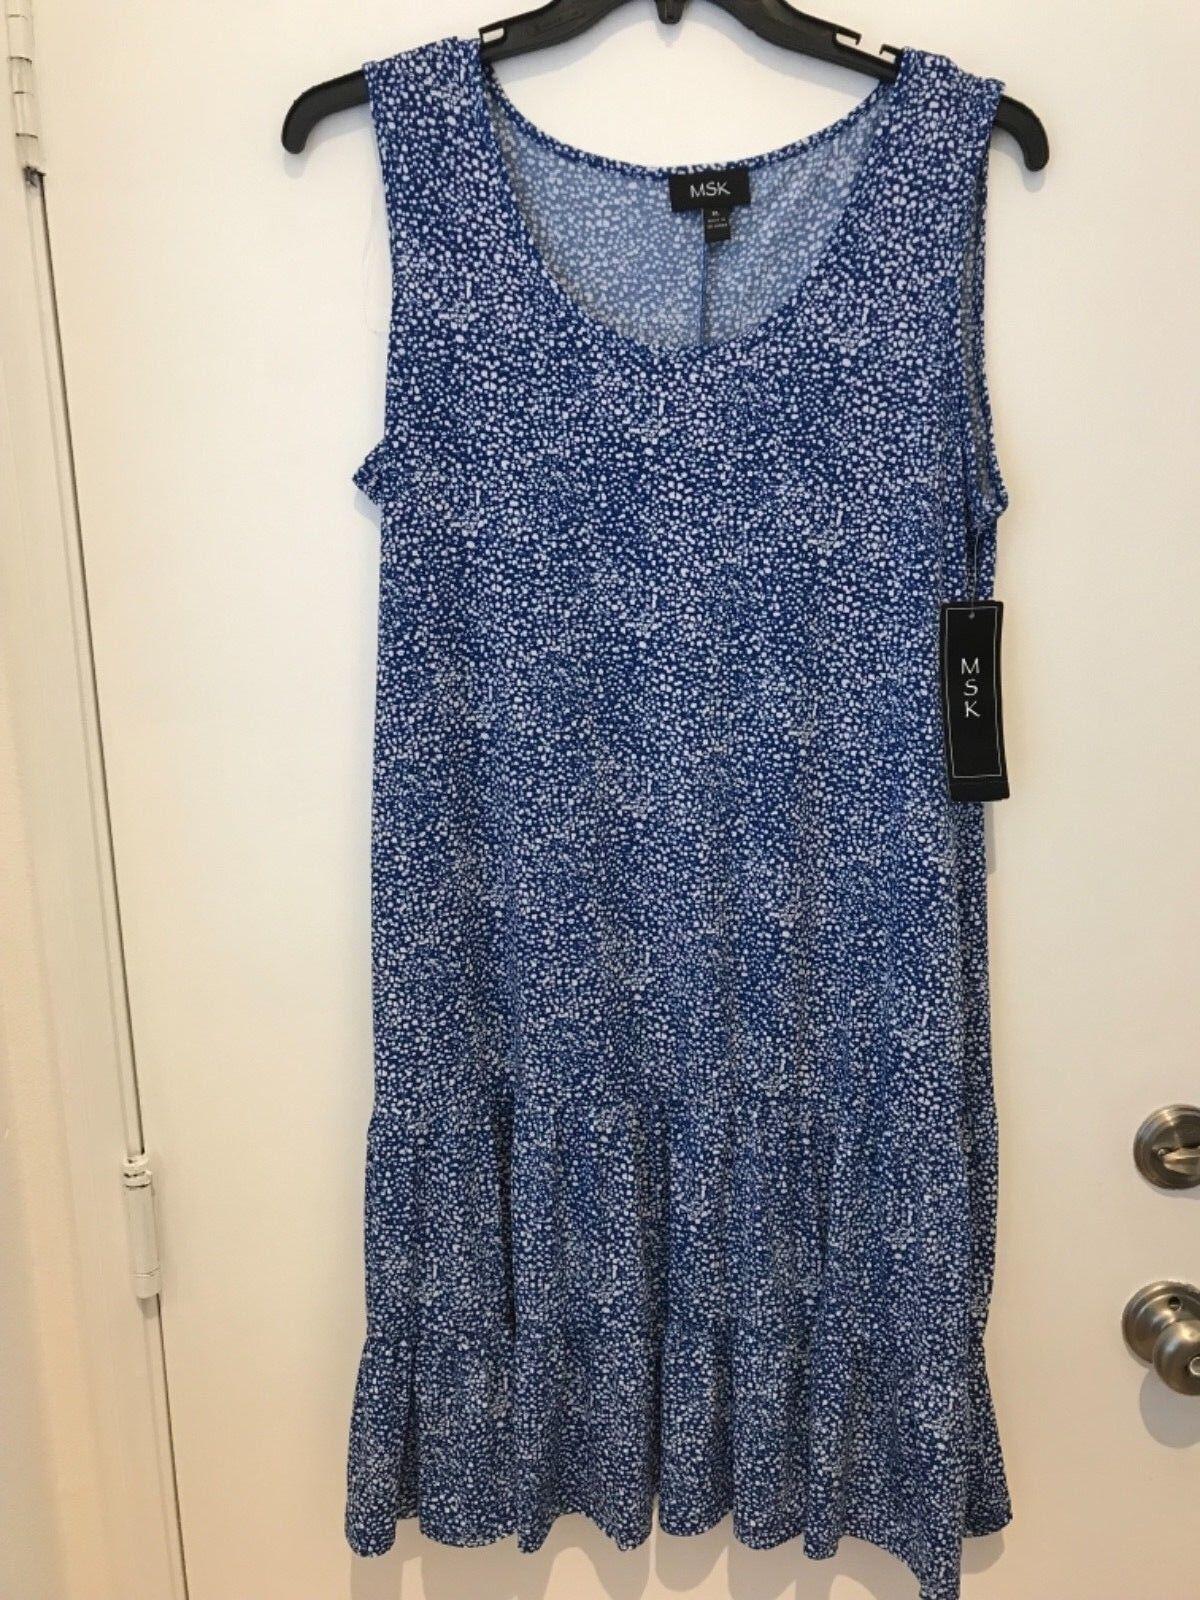 MSK bluee Womens Size XL bluee White ruffle hem Dress NWT